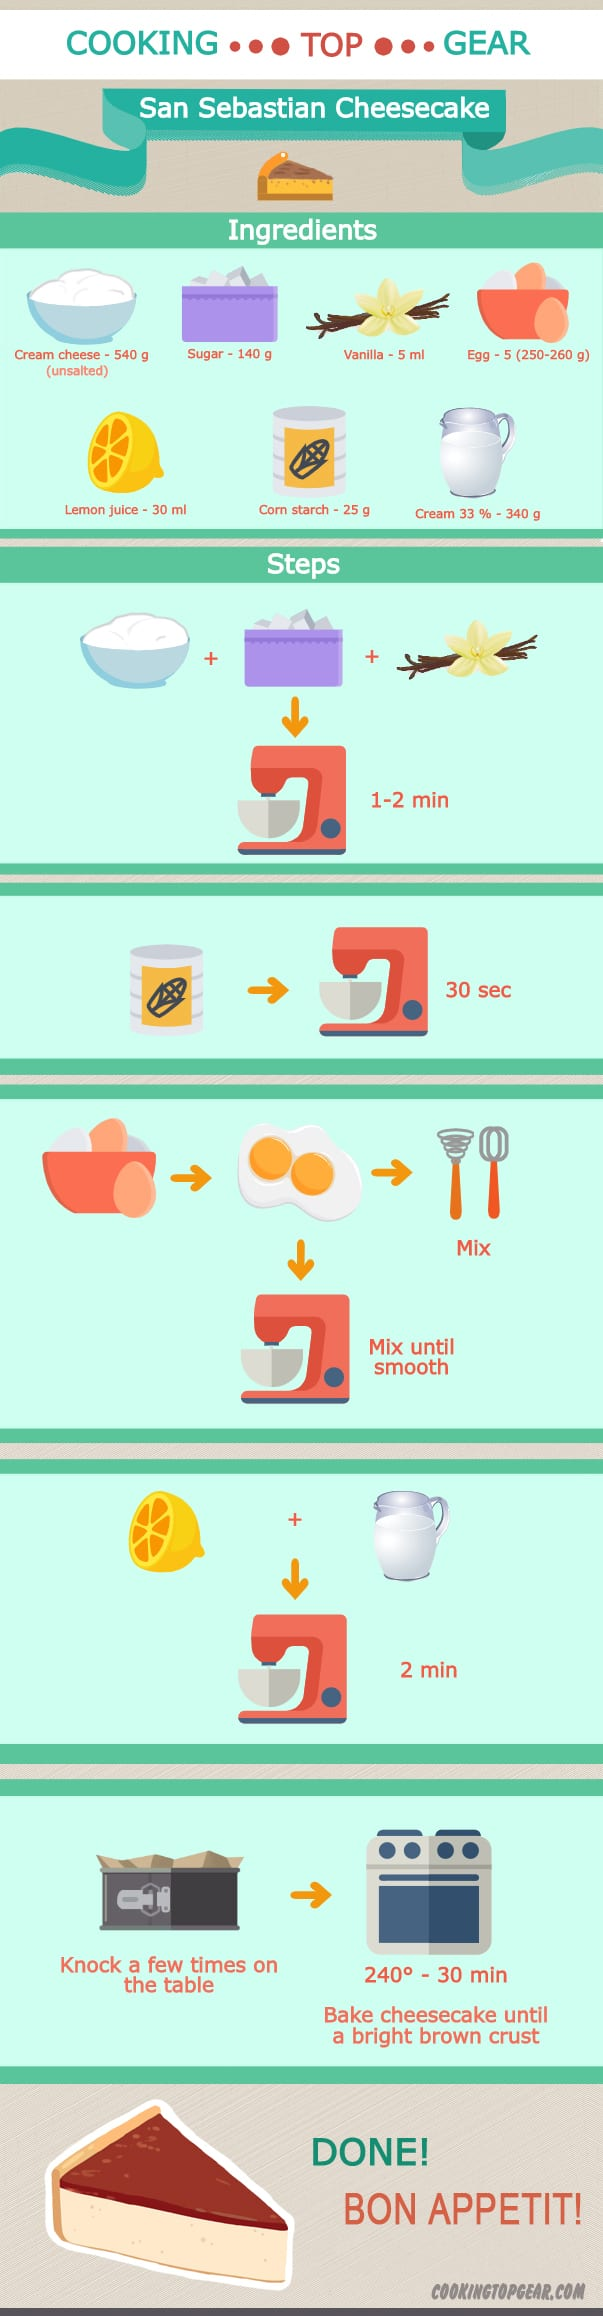 cookingtopgear infographics